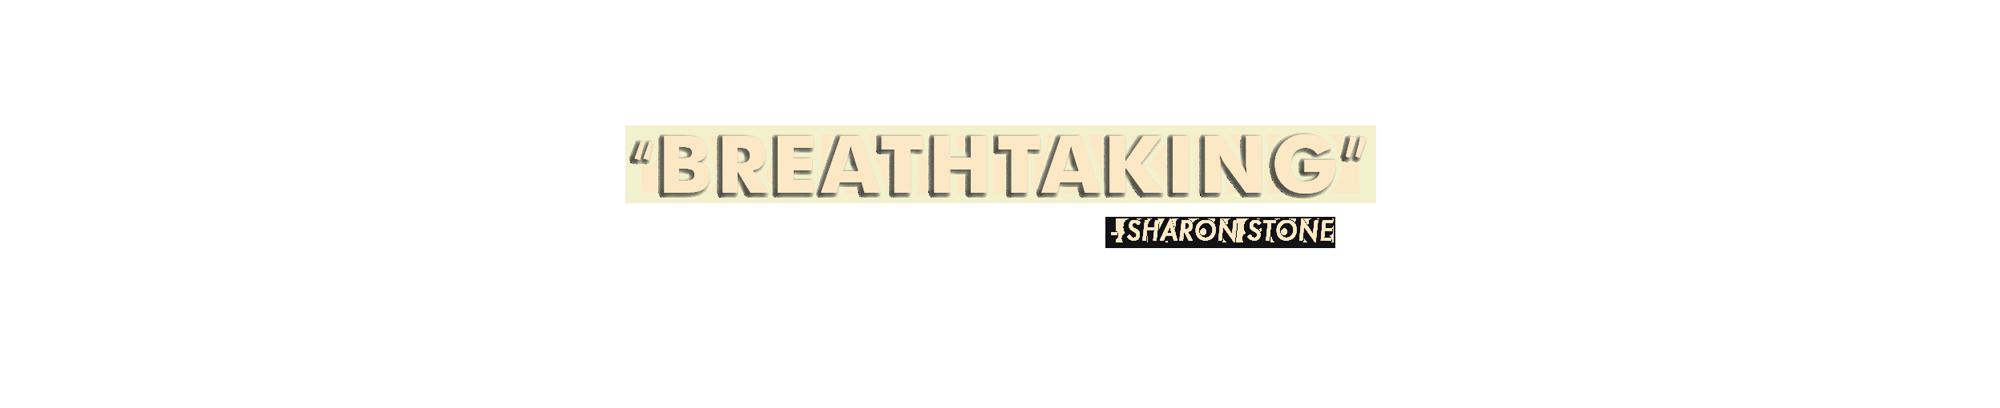 Sharon Stone breathtaking